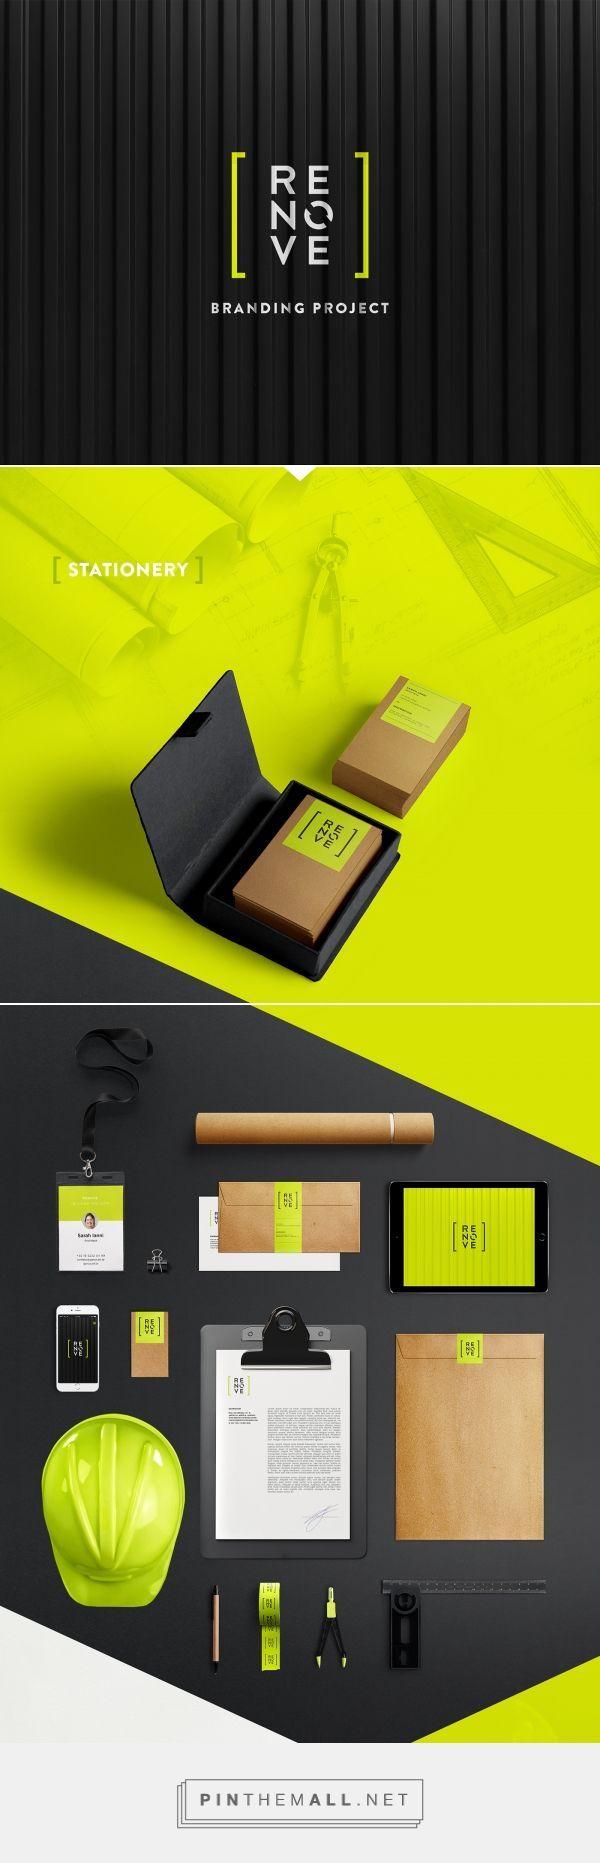 Renove | Brand Identity on Behance  | Fivestar Branding – Design and Branding Agency & Inspiration Gallery